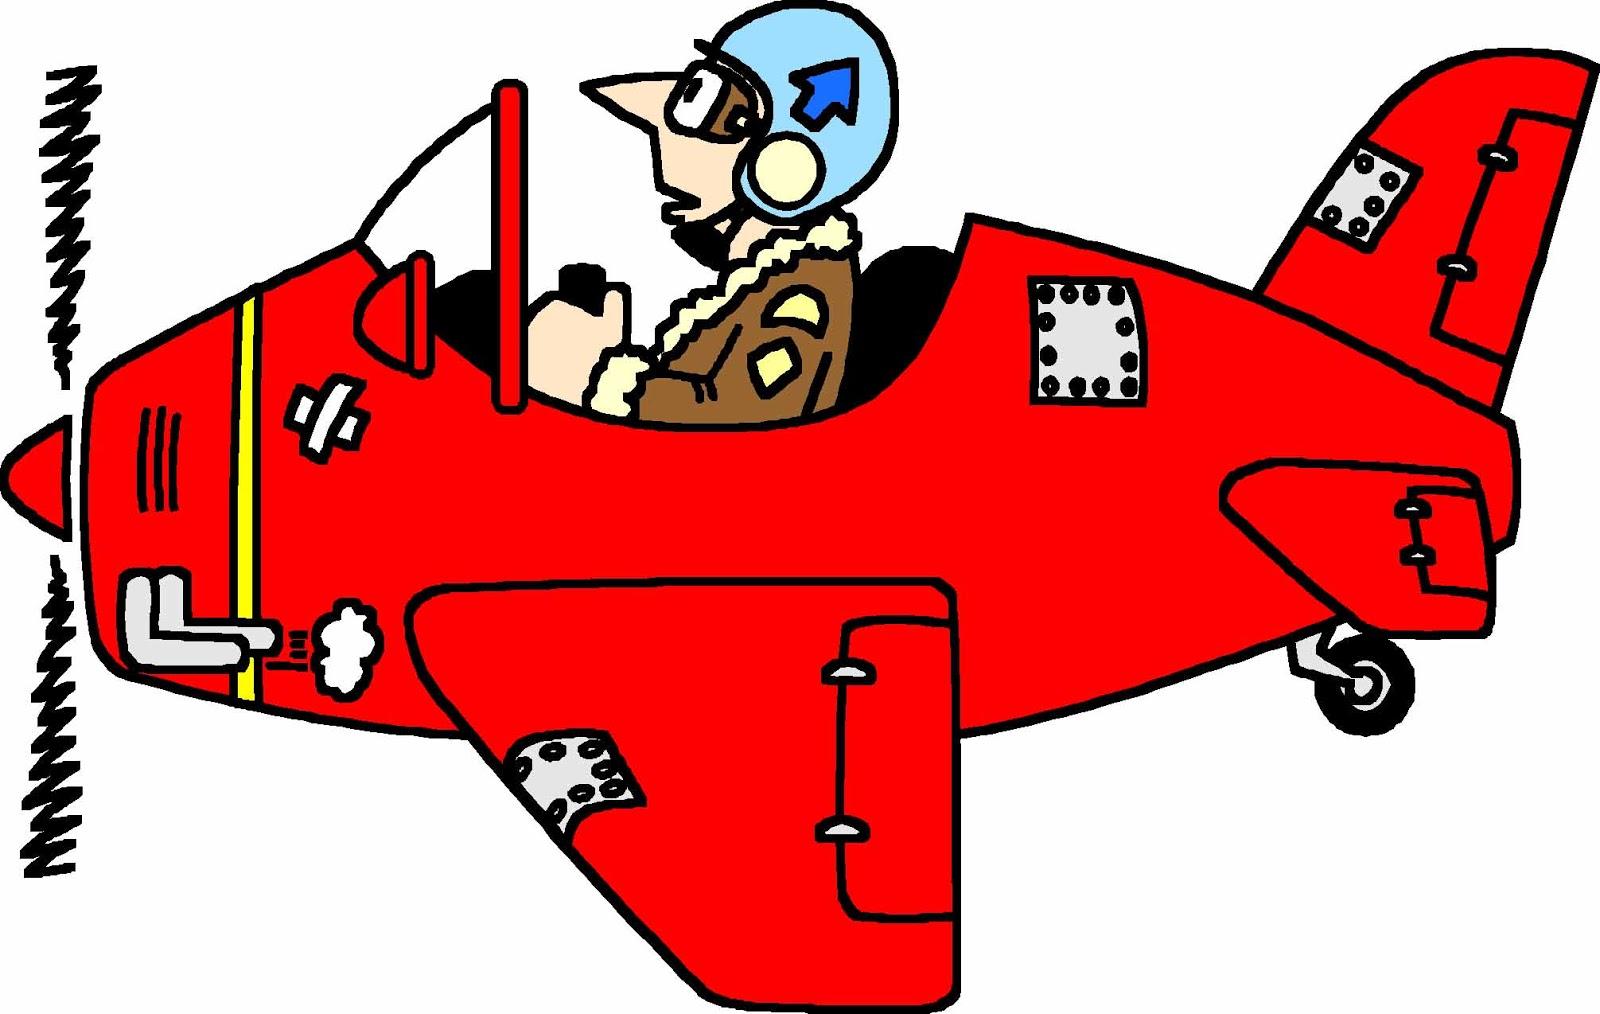 1600x1014 Plane Drawings Clip Art